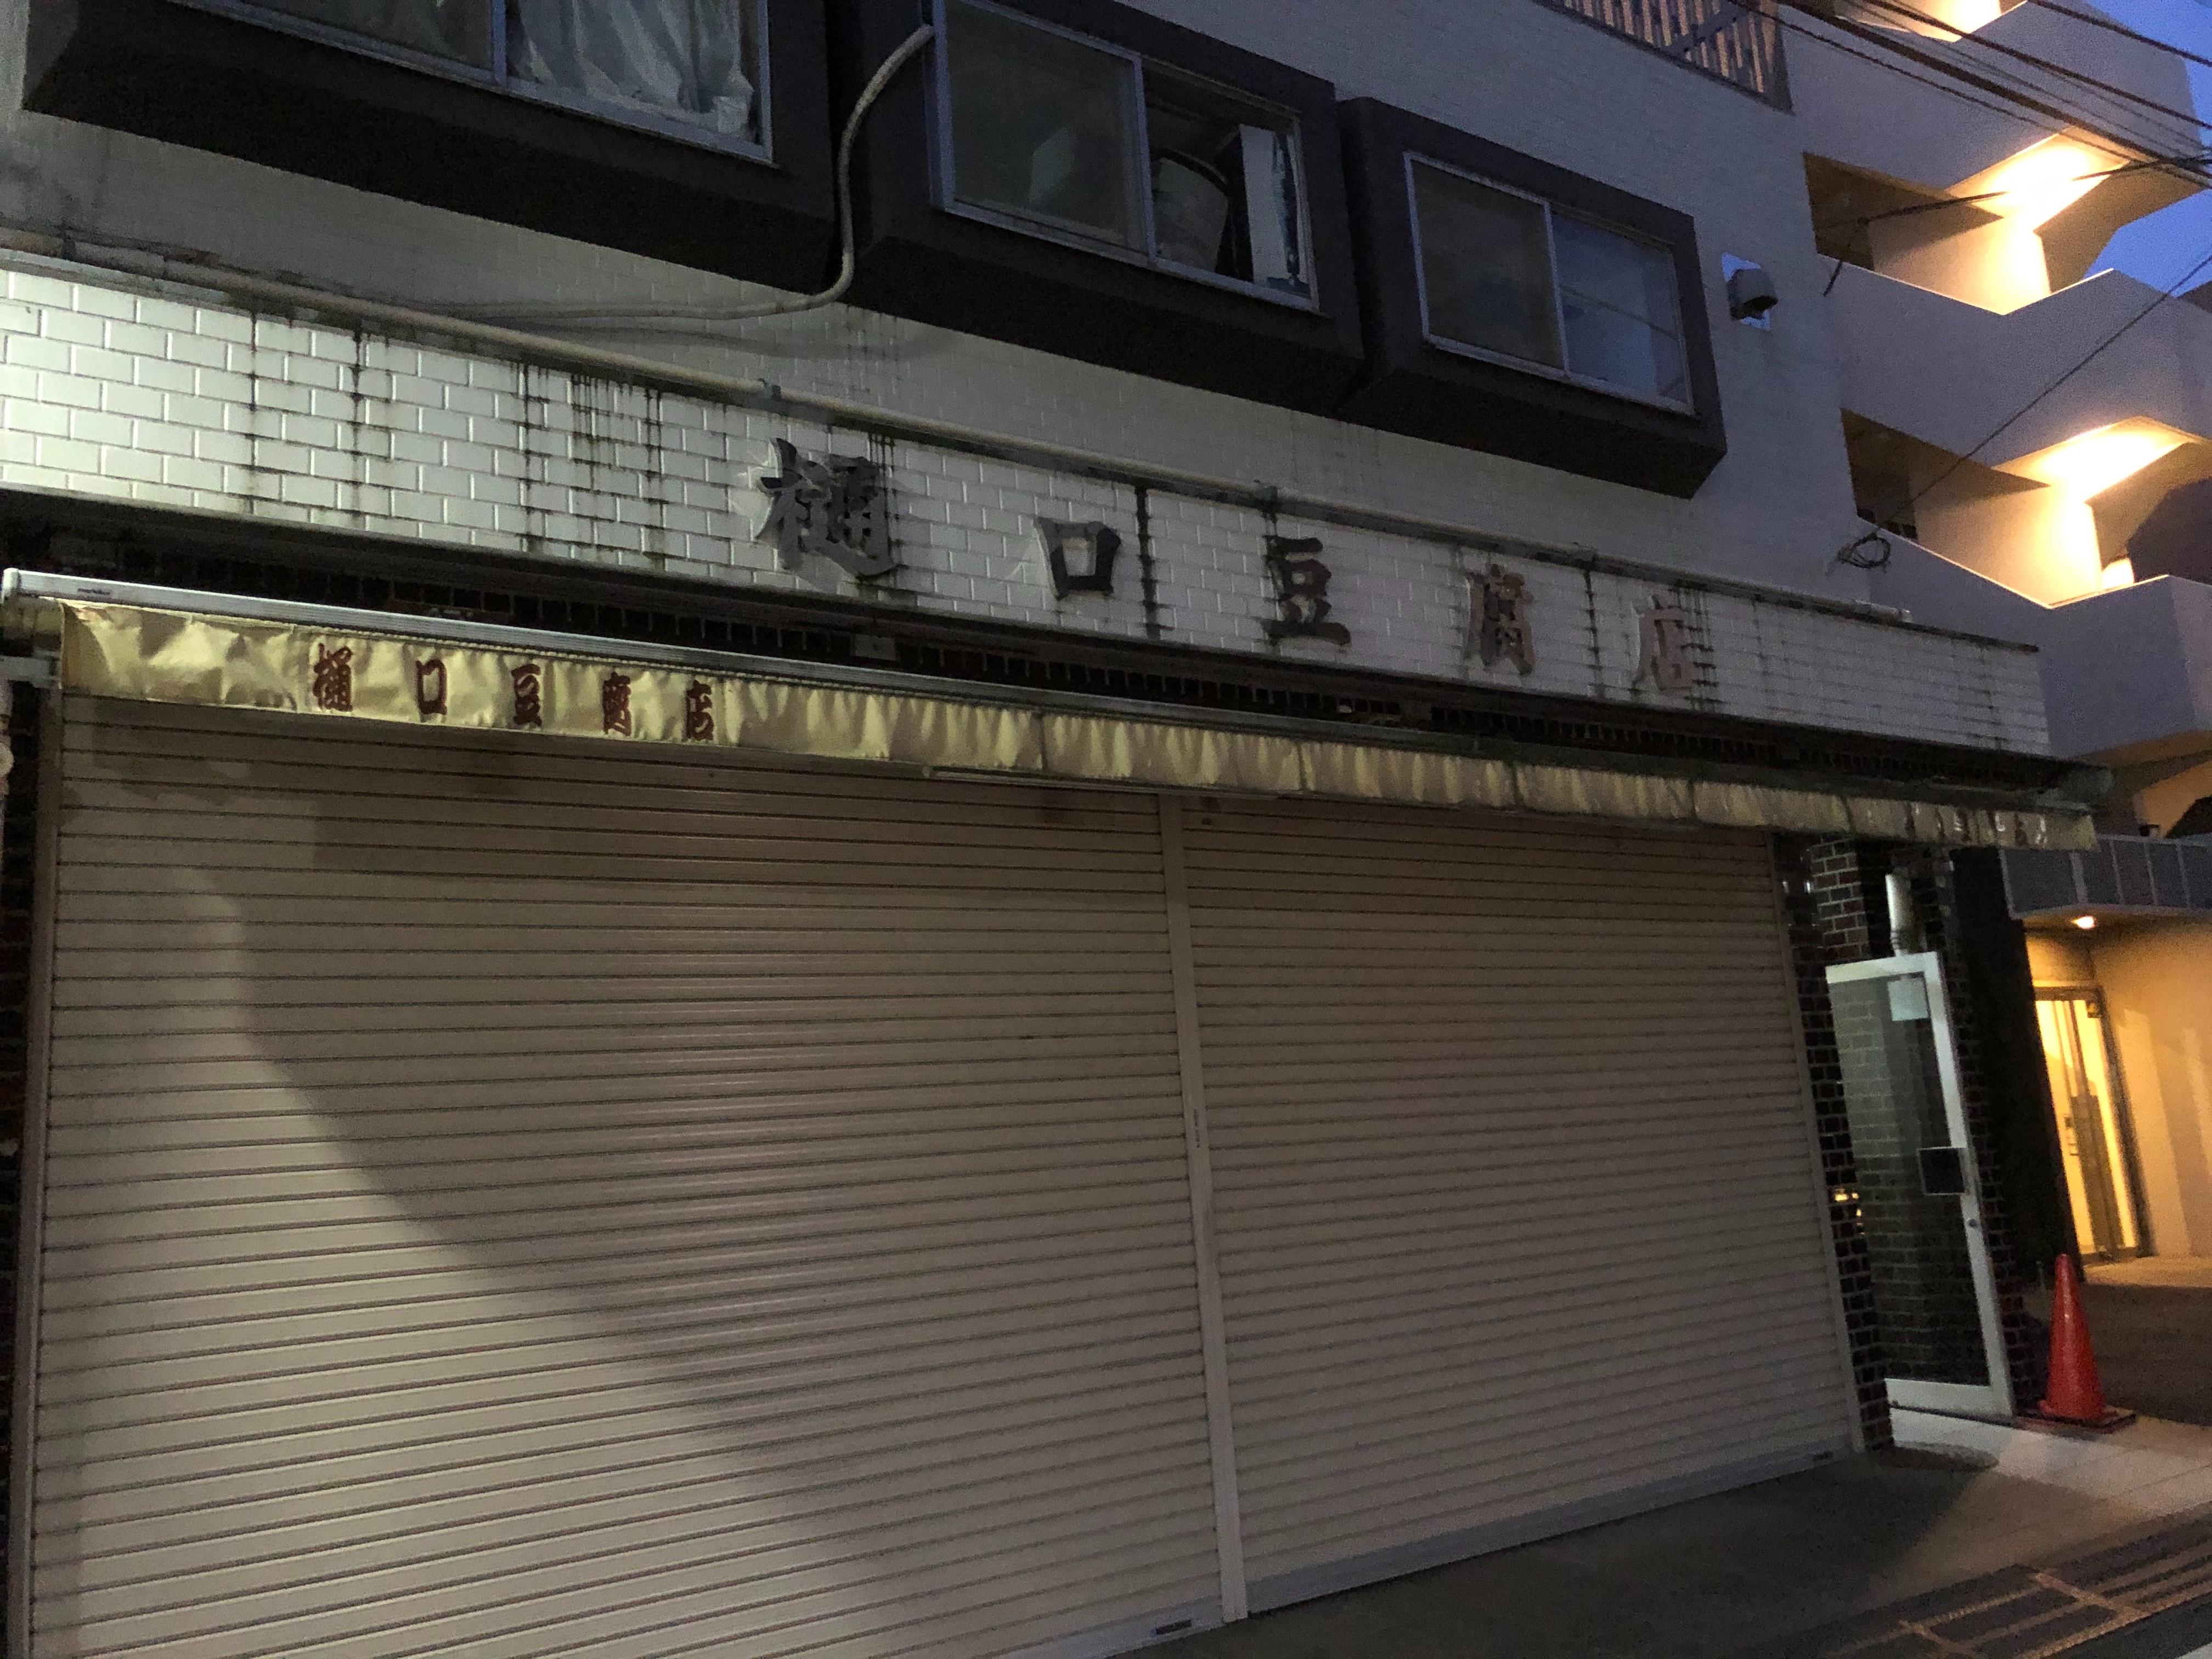 f:id:shinanoarai64:20210214162224j:plain